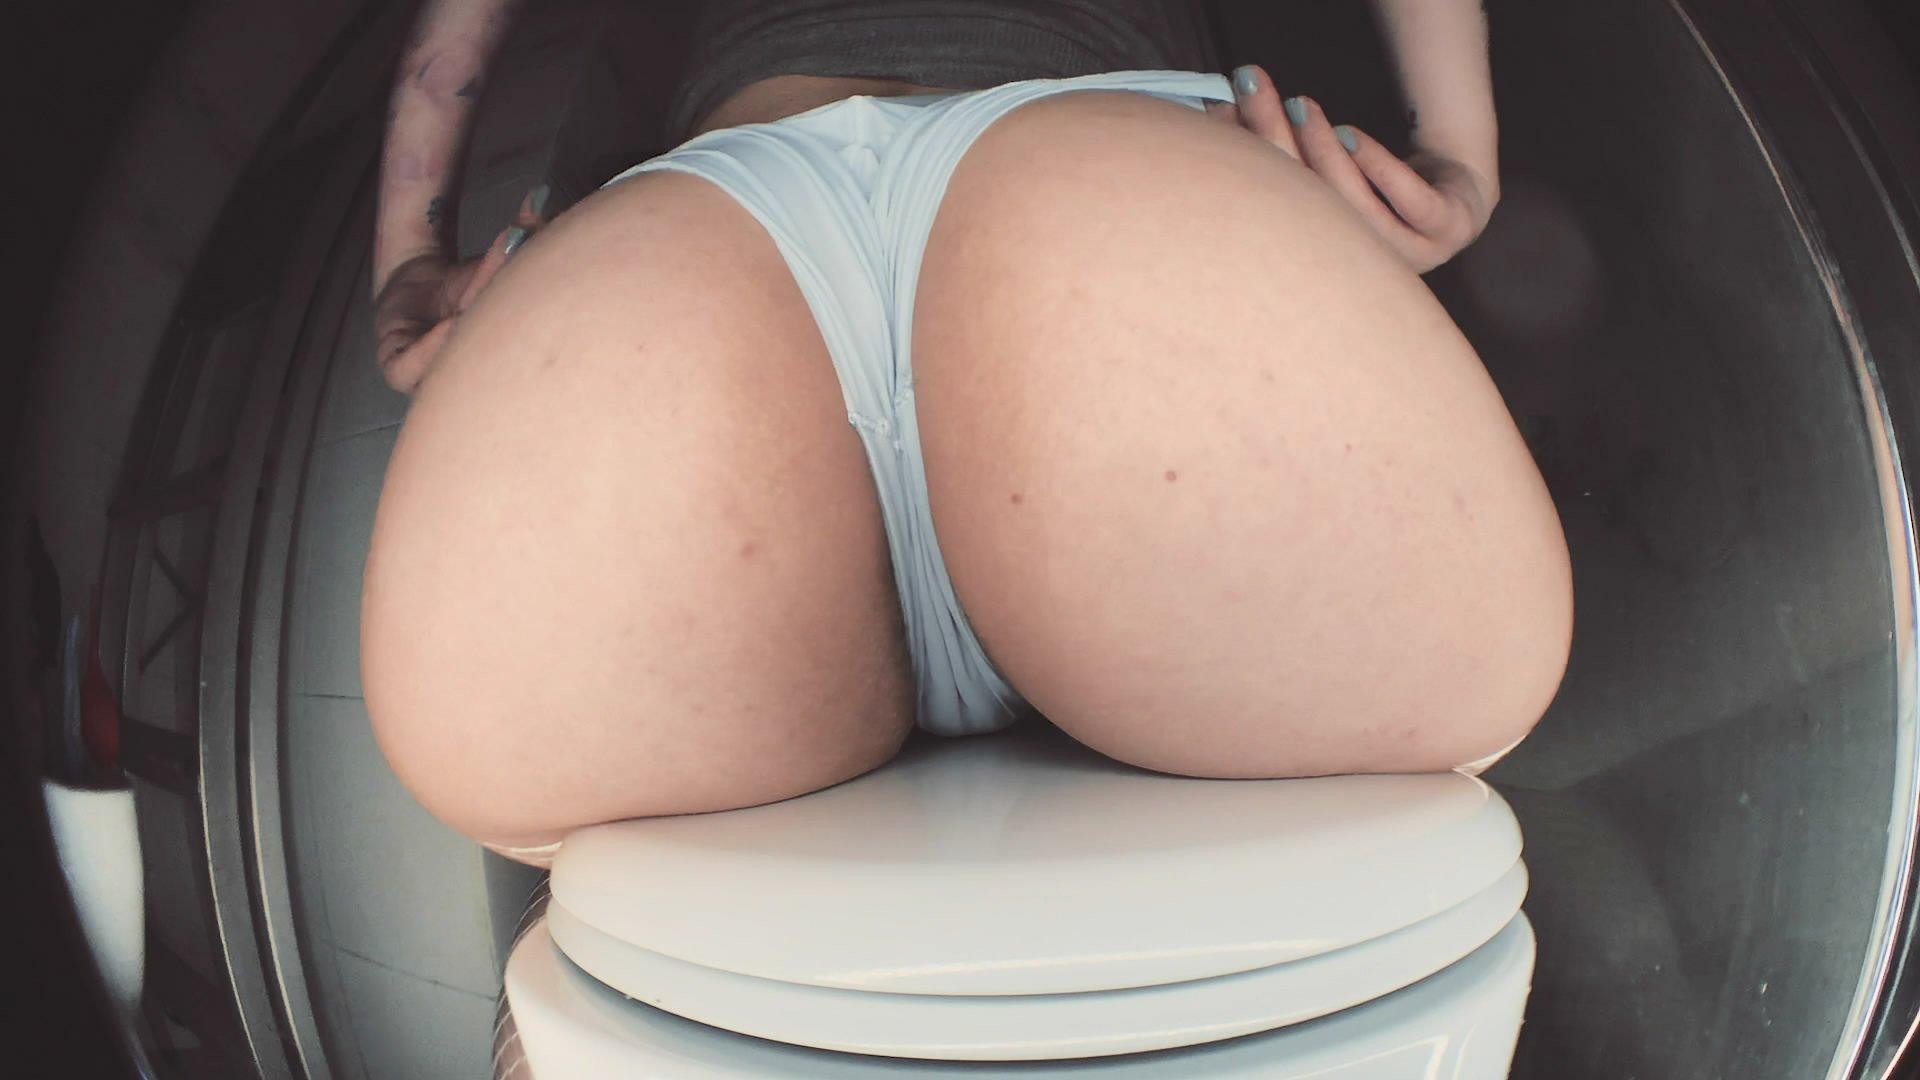 Stinking curse vs. White panties  starring in video DirtyBetty ($16.99 ScatShop) – Enema